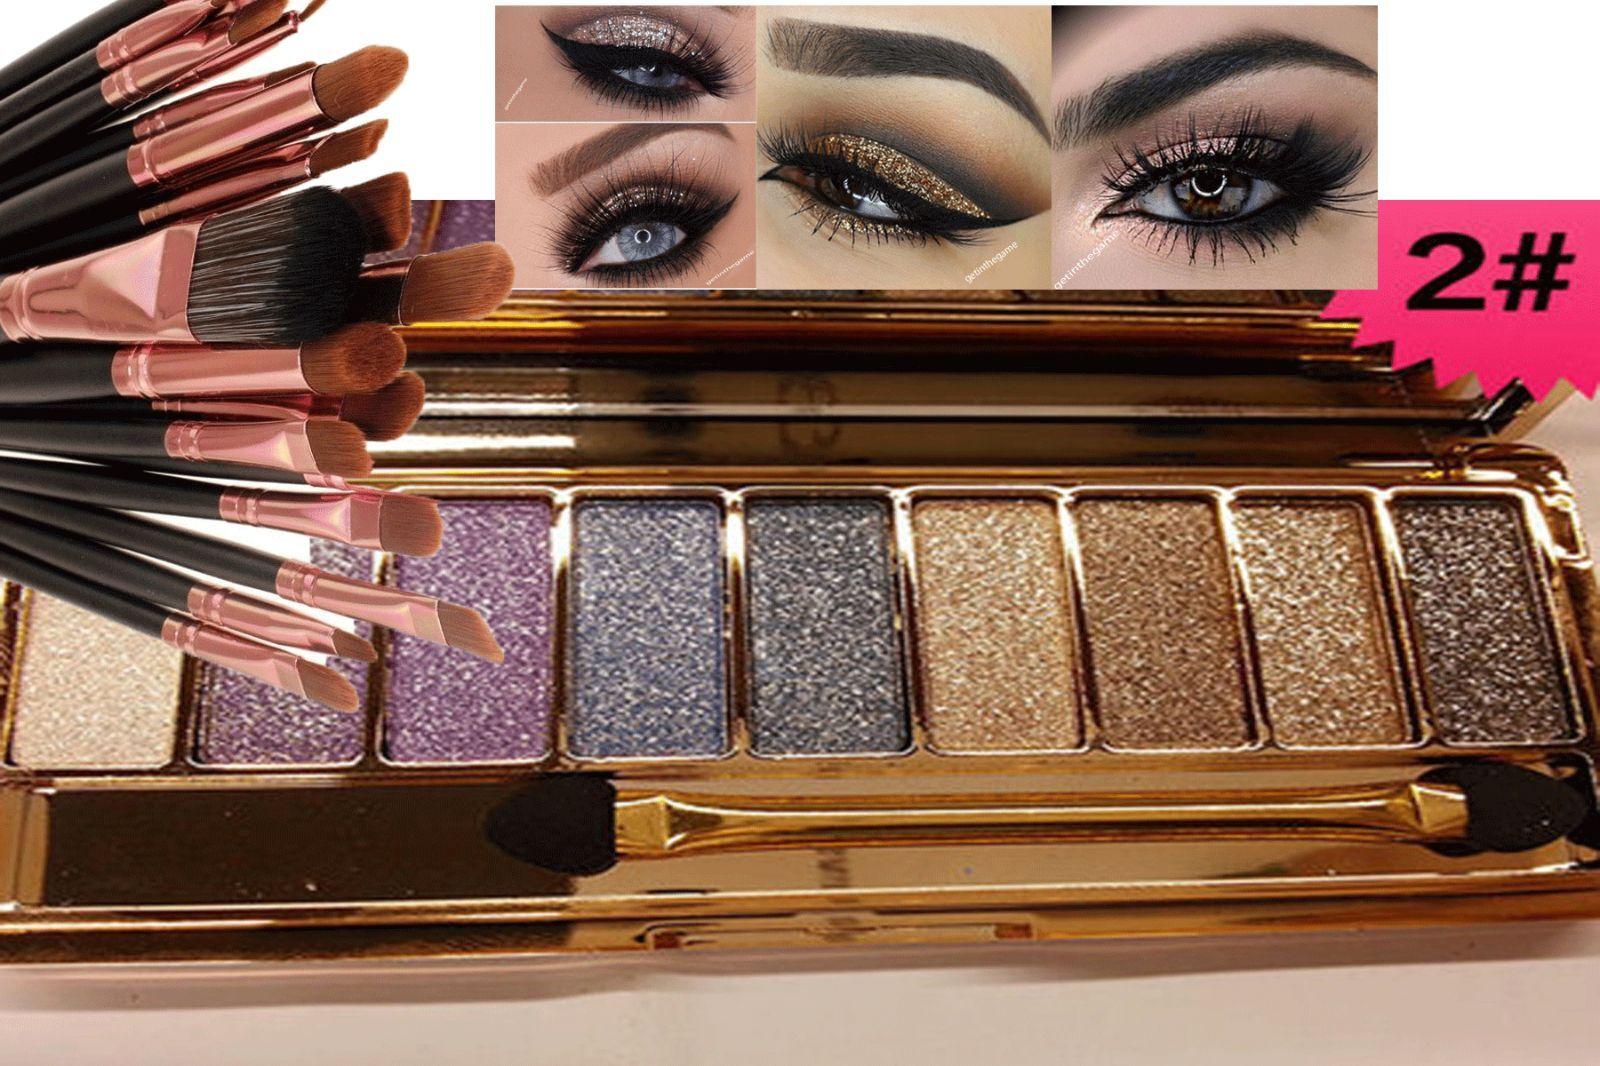 9 Colors Glitter Eyeshadow Eye Shadow Palette & Makeup Cosmetic Brush Set NEW